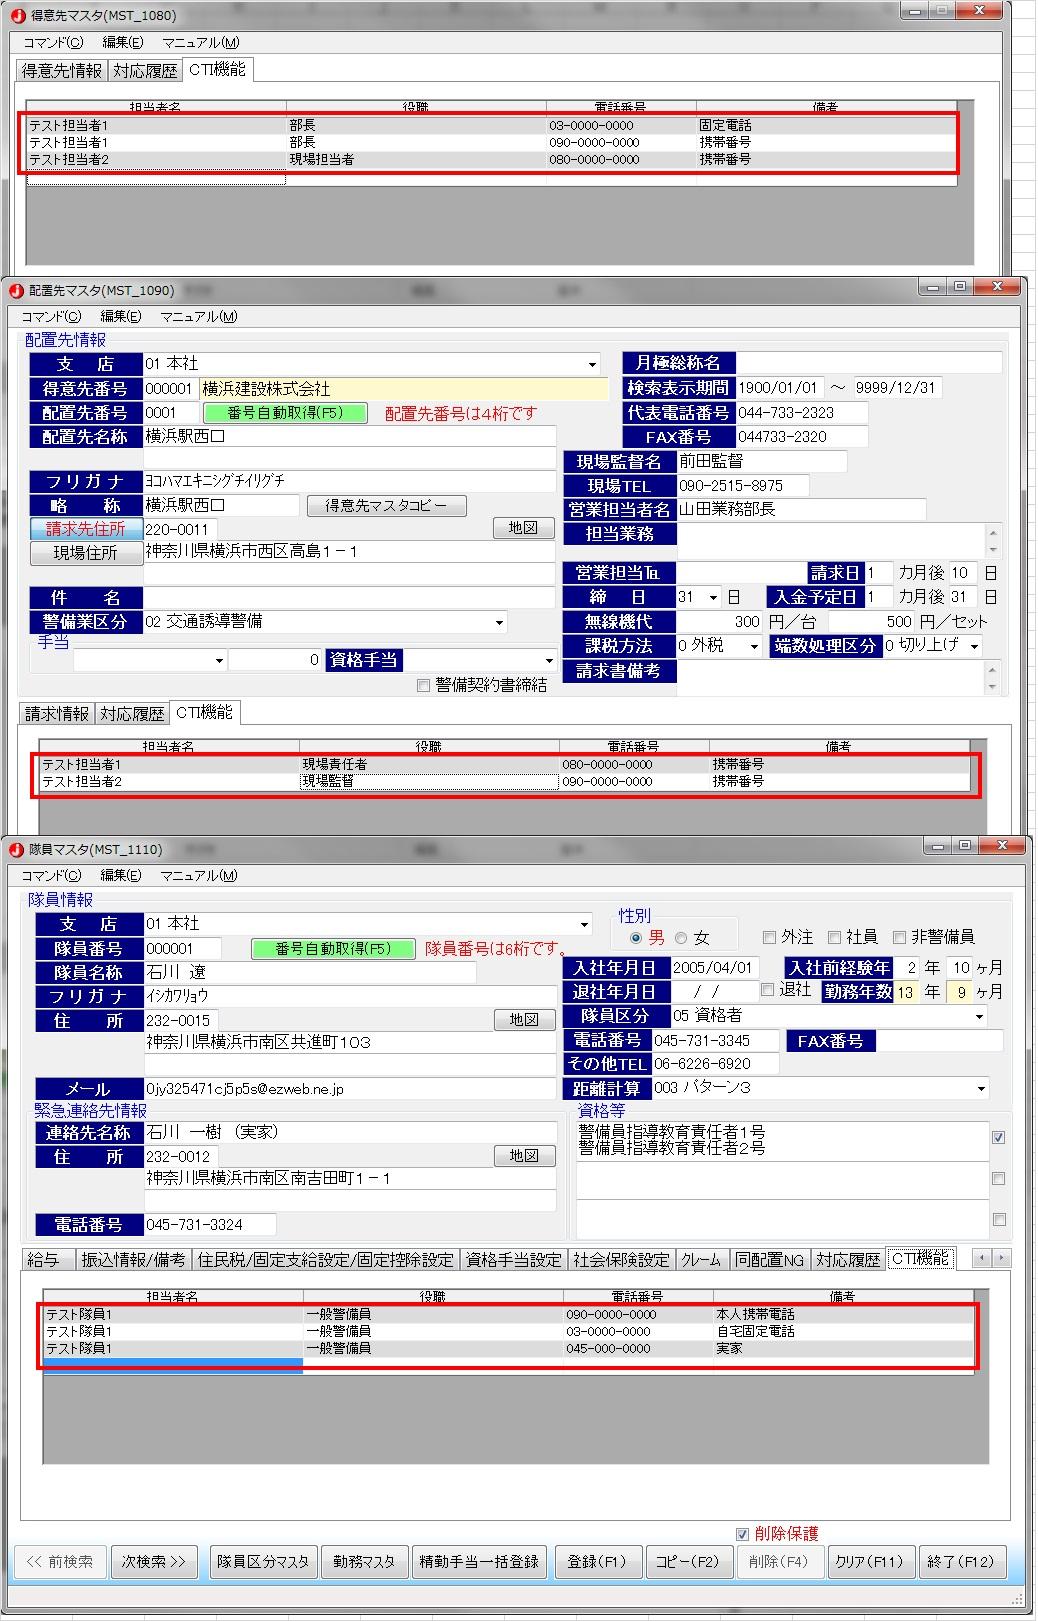 JBCA警備Pro CTIバージョンアップ